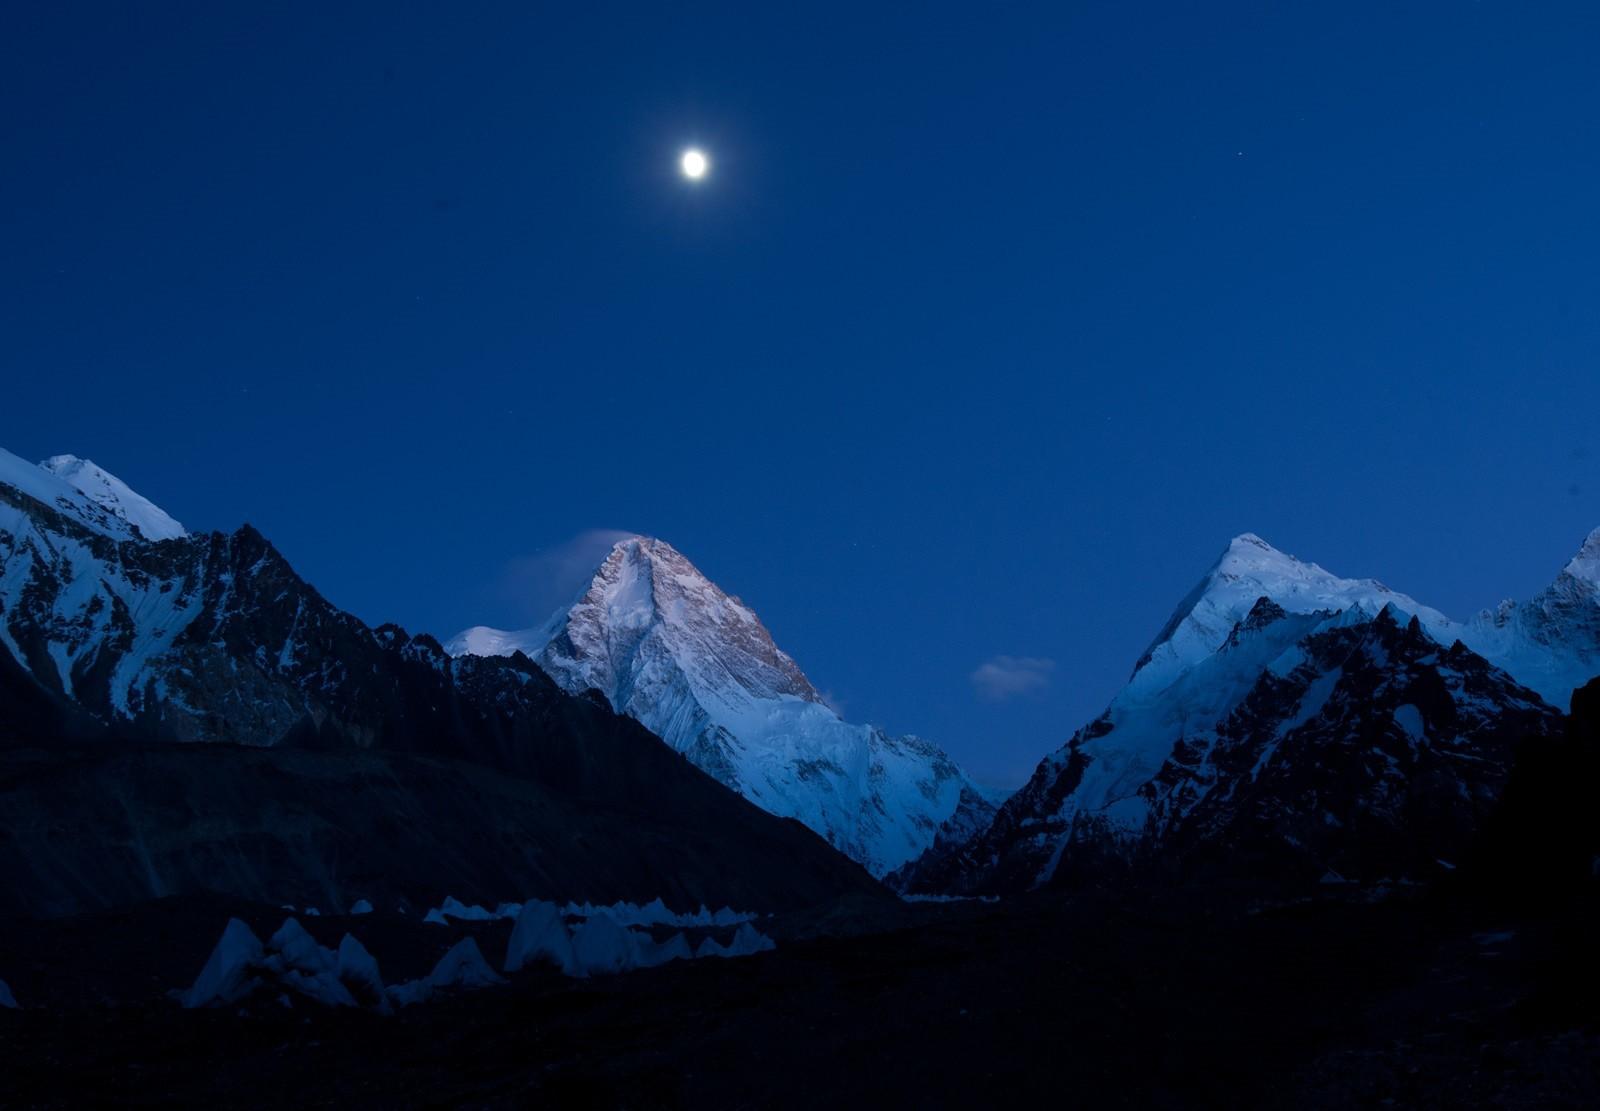 Himalaya Hd Wallpaper Fondos De Pantalla Paisaje Monta 241 As Noche Naturaleza